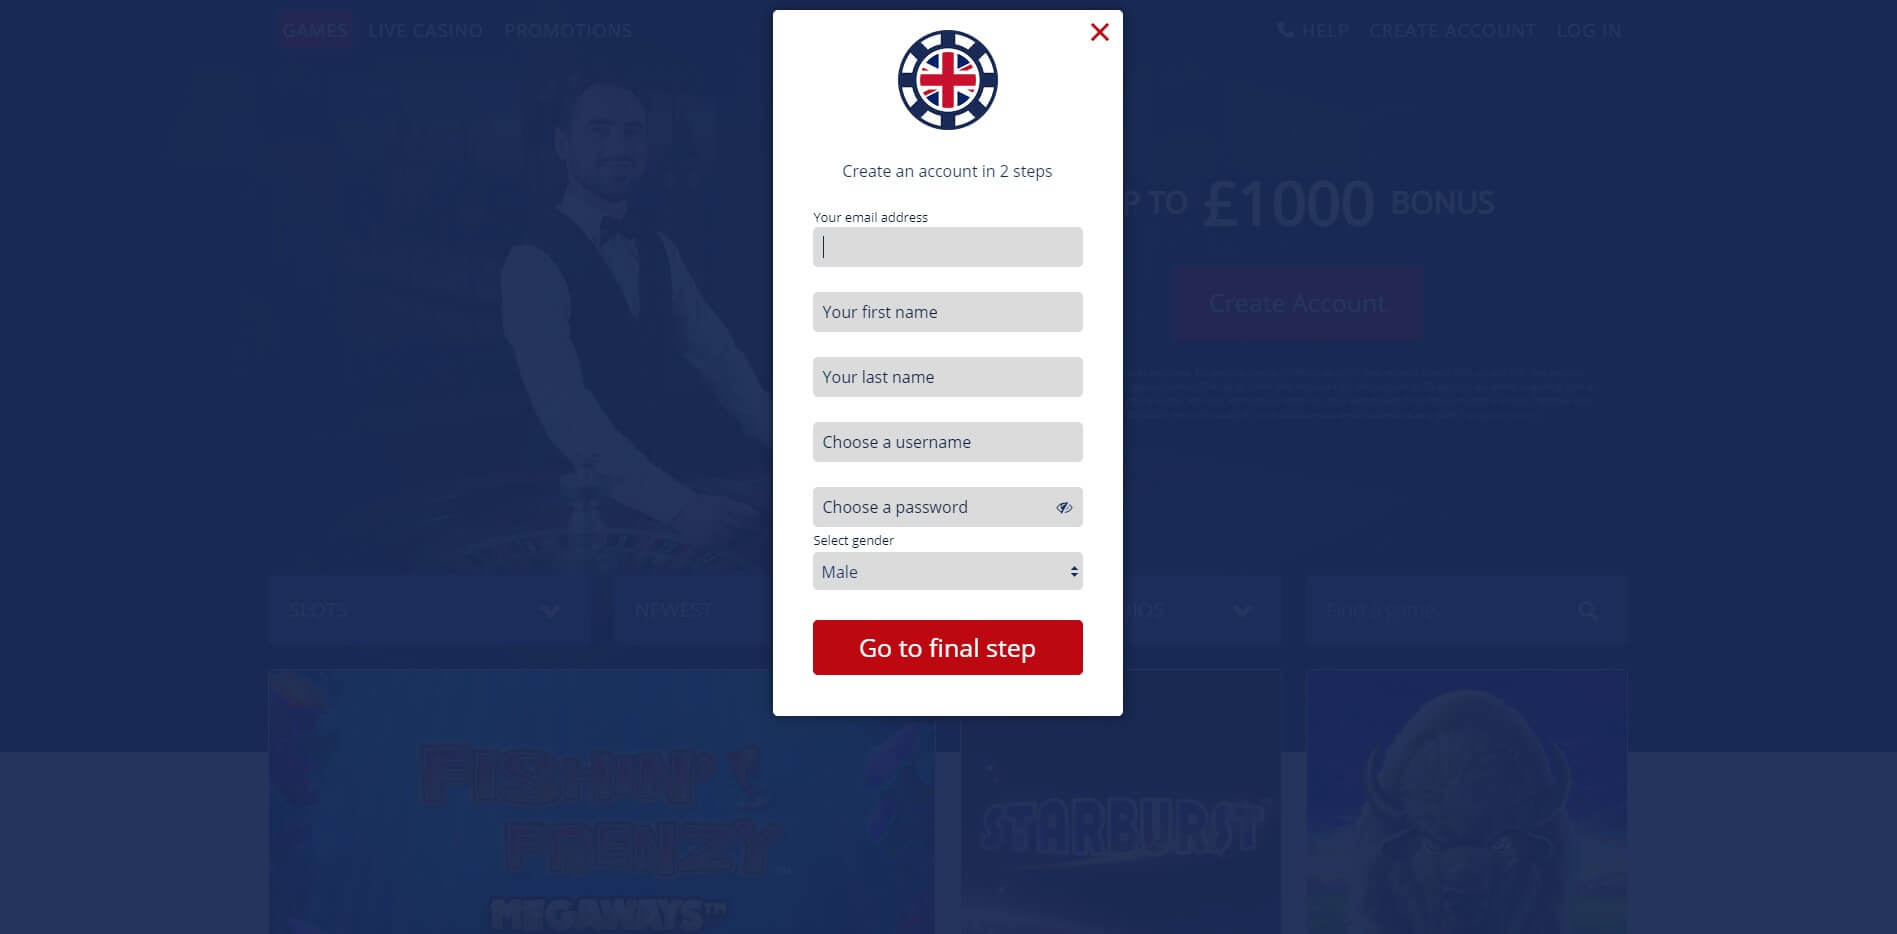 Sign Up at Great British Casino